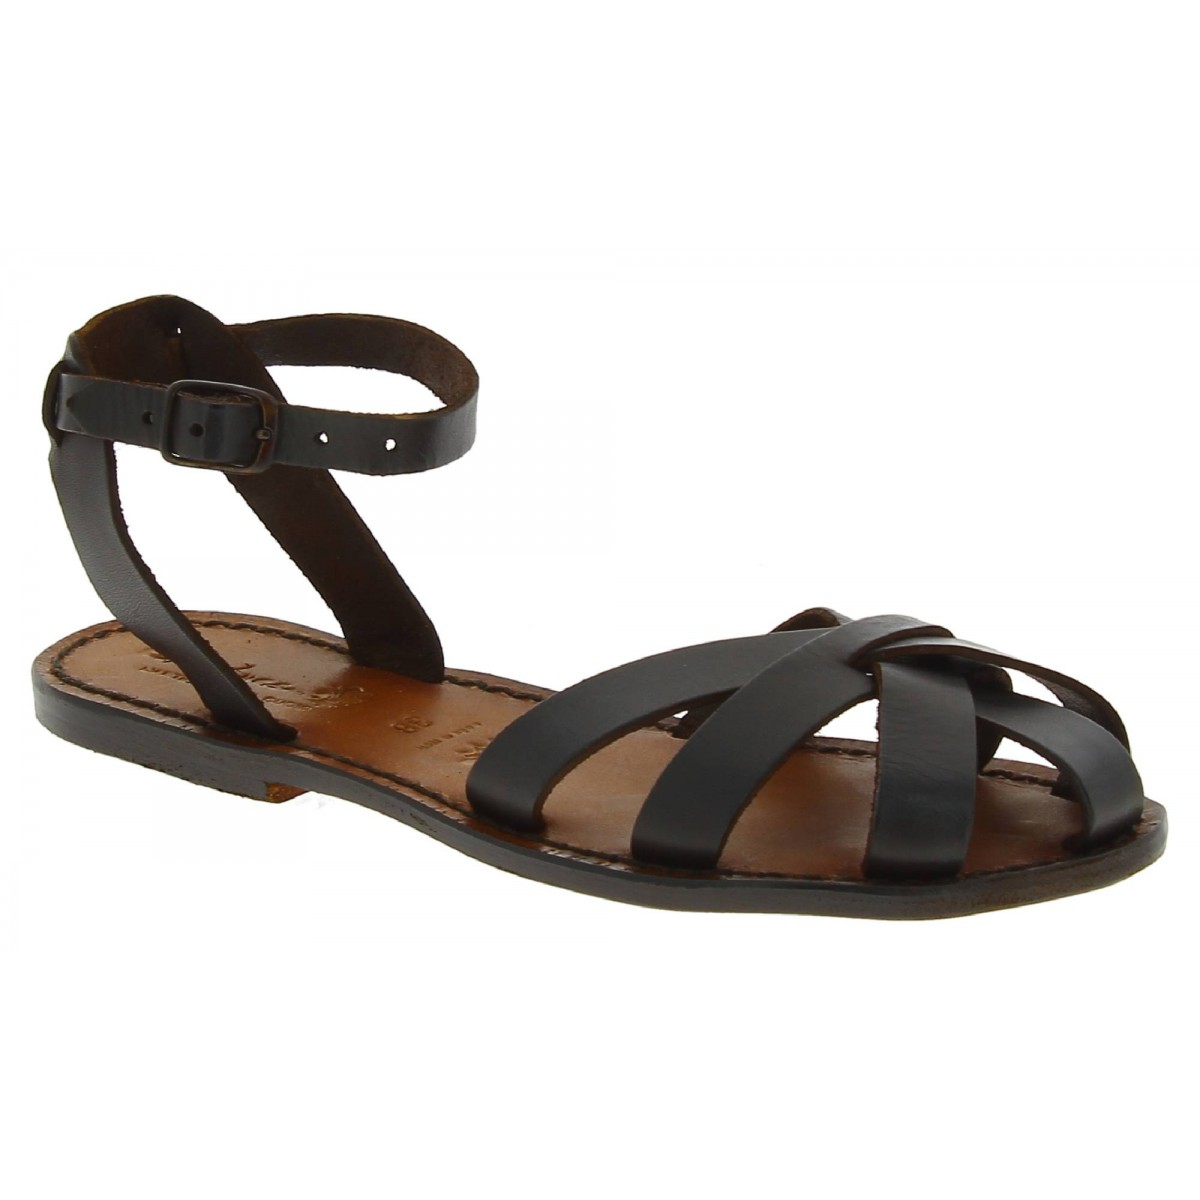 b363a42999dbf2 Handmade dark brown flat sandals for women real italian leather. Loading  zoom